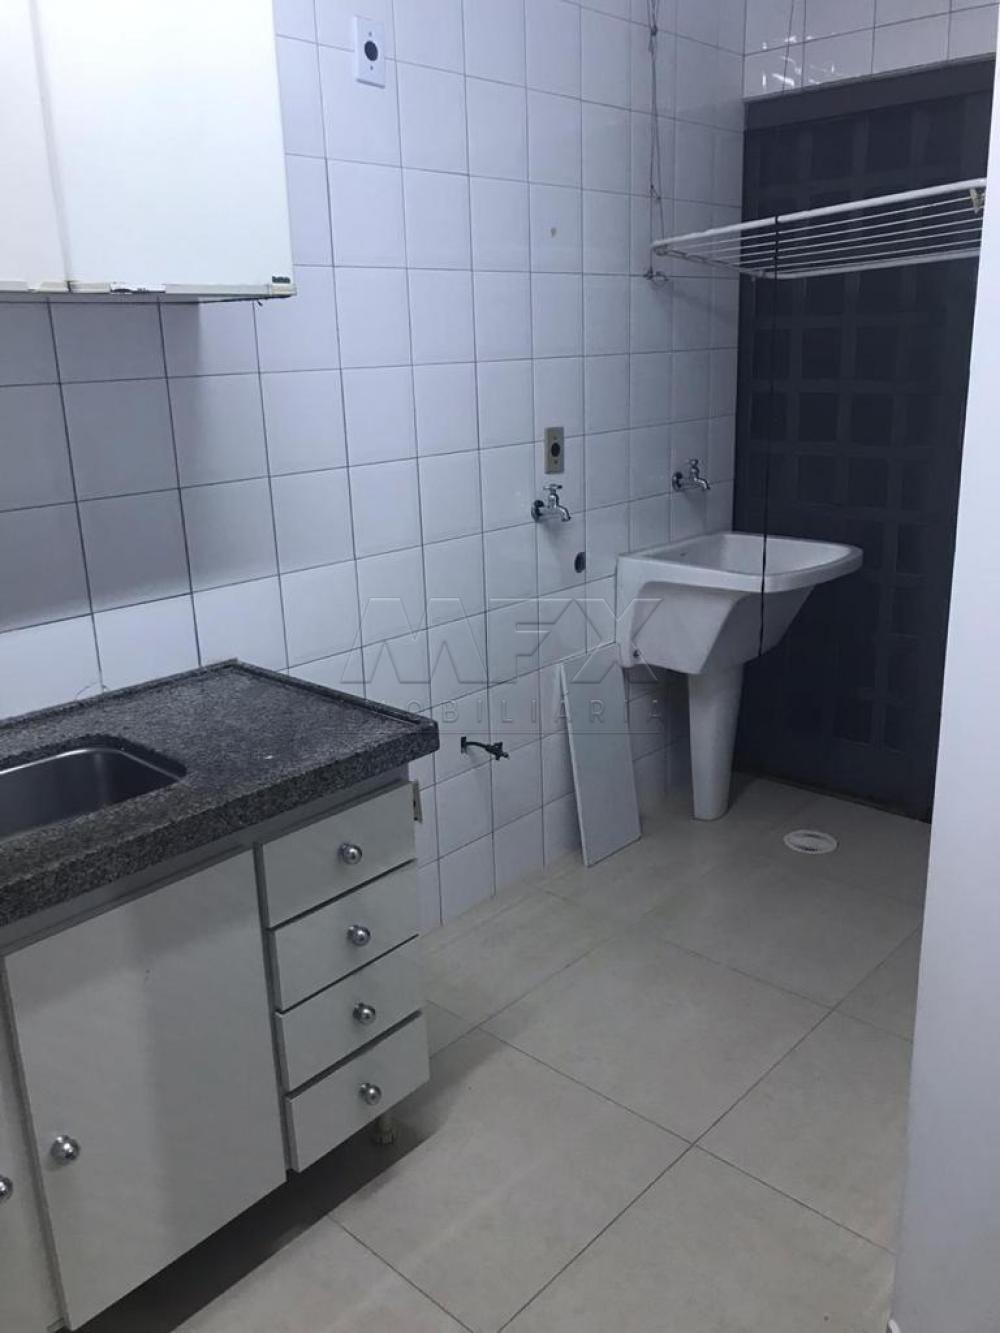 Comprar Apartamento / Kitchnet em Bauru R$ 135.000,00 - Foto 7